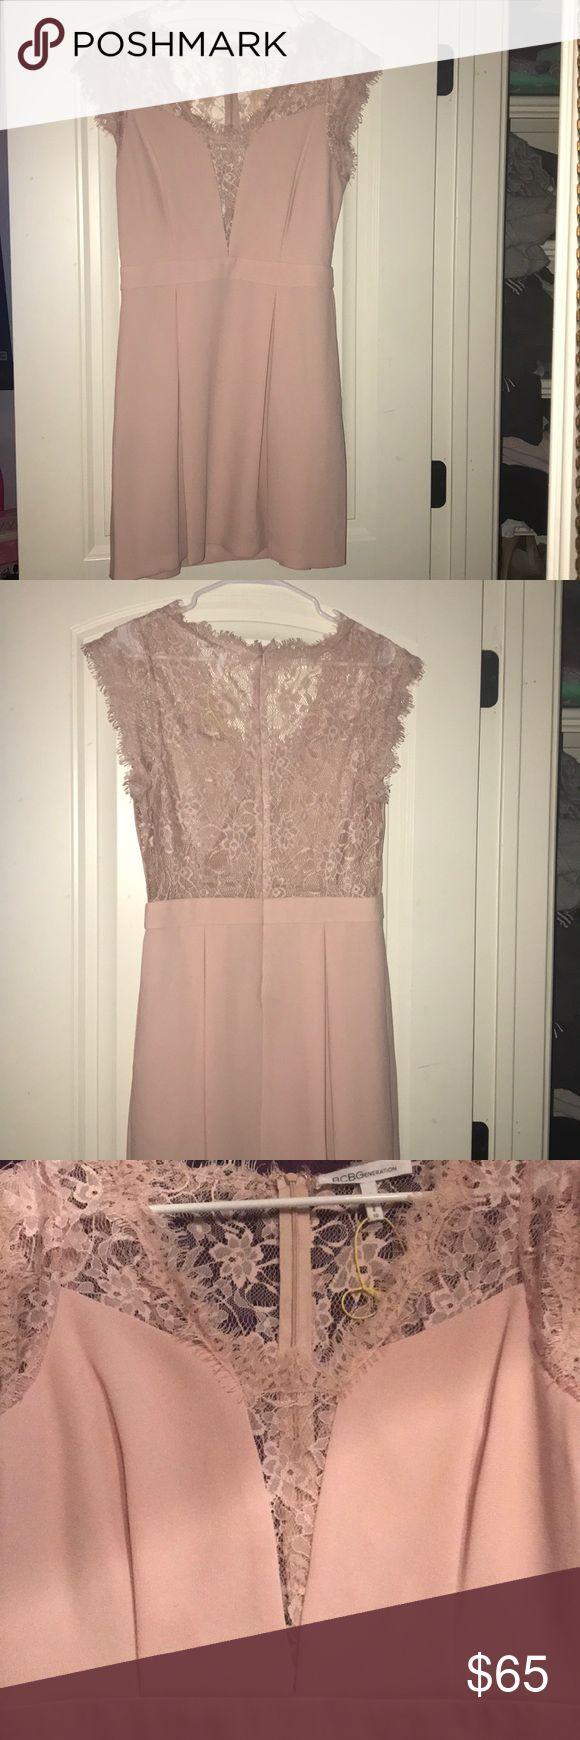 Blush and Lace BCBGeneration dress Classy but fun blush dress. It has a deep V with lace appliqués and a open lace back BCBGeneration Dresses